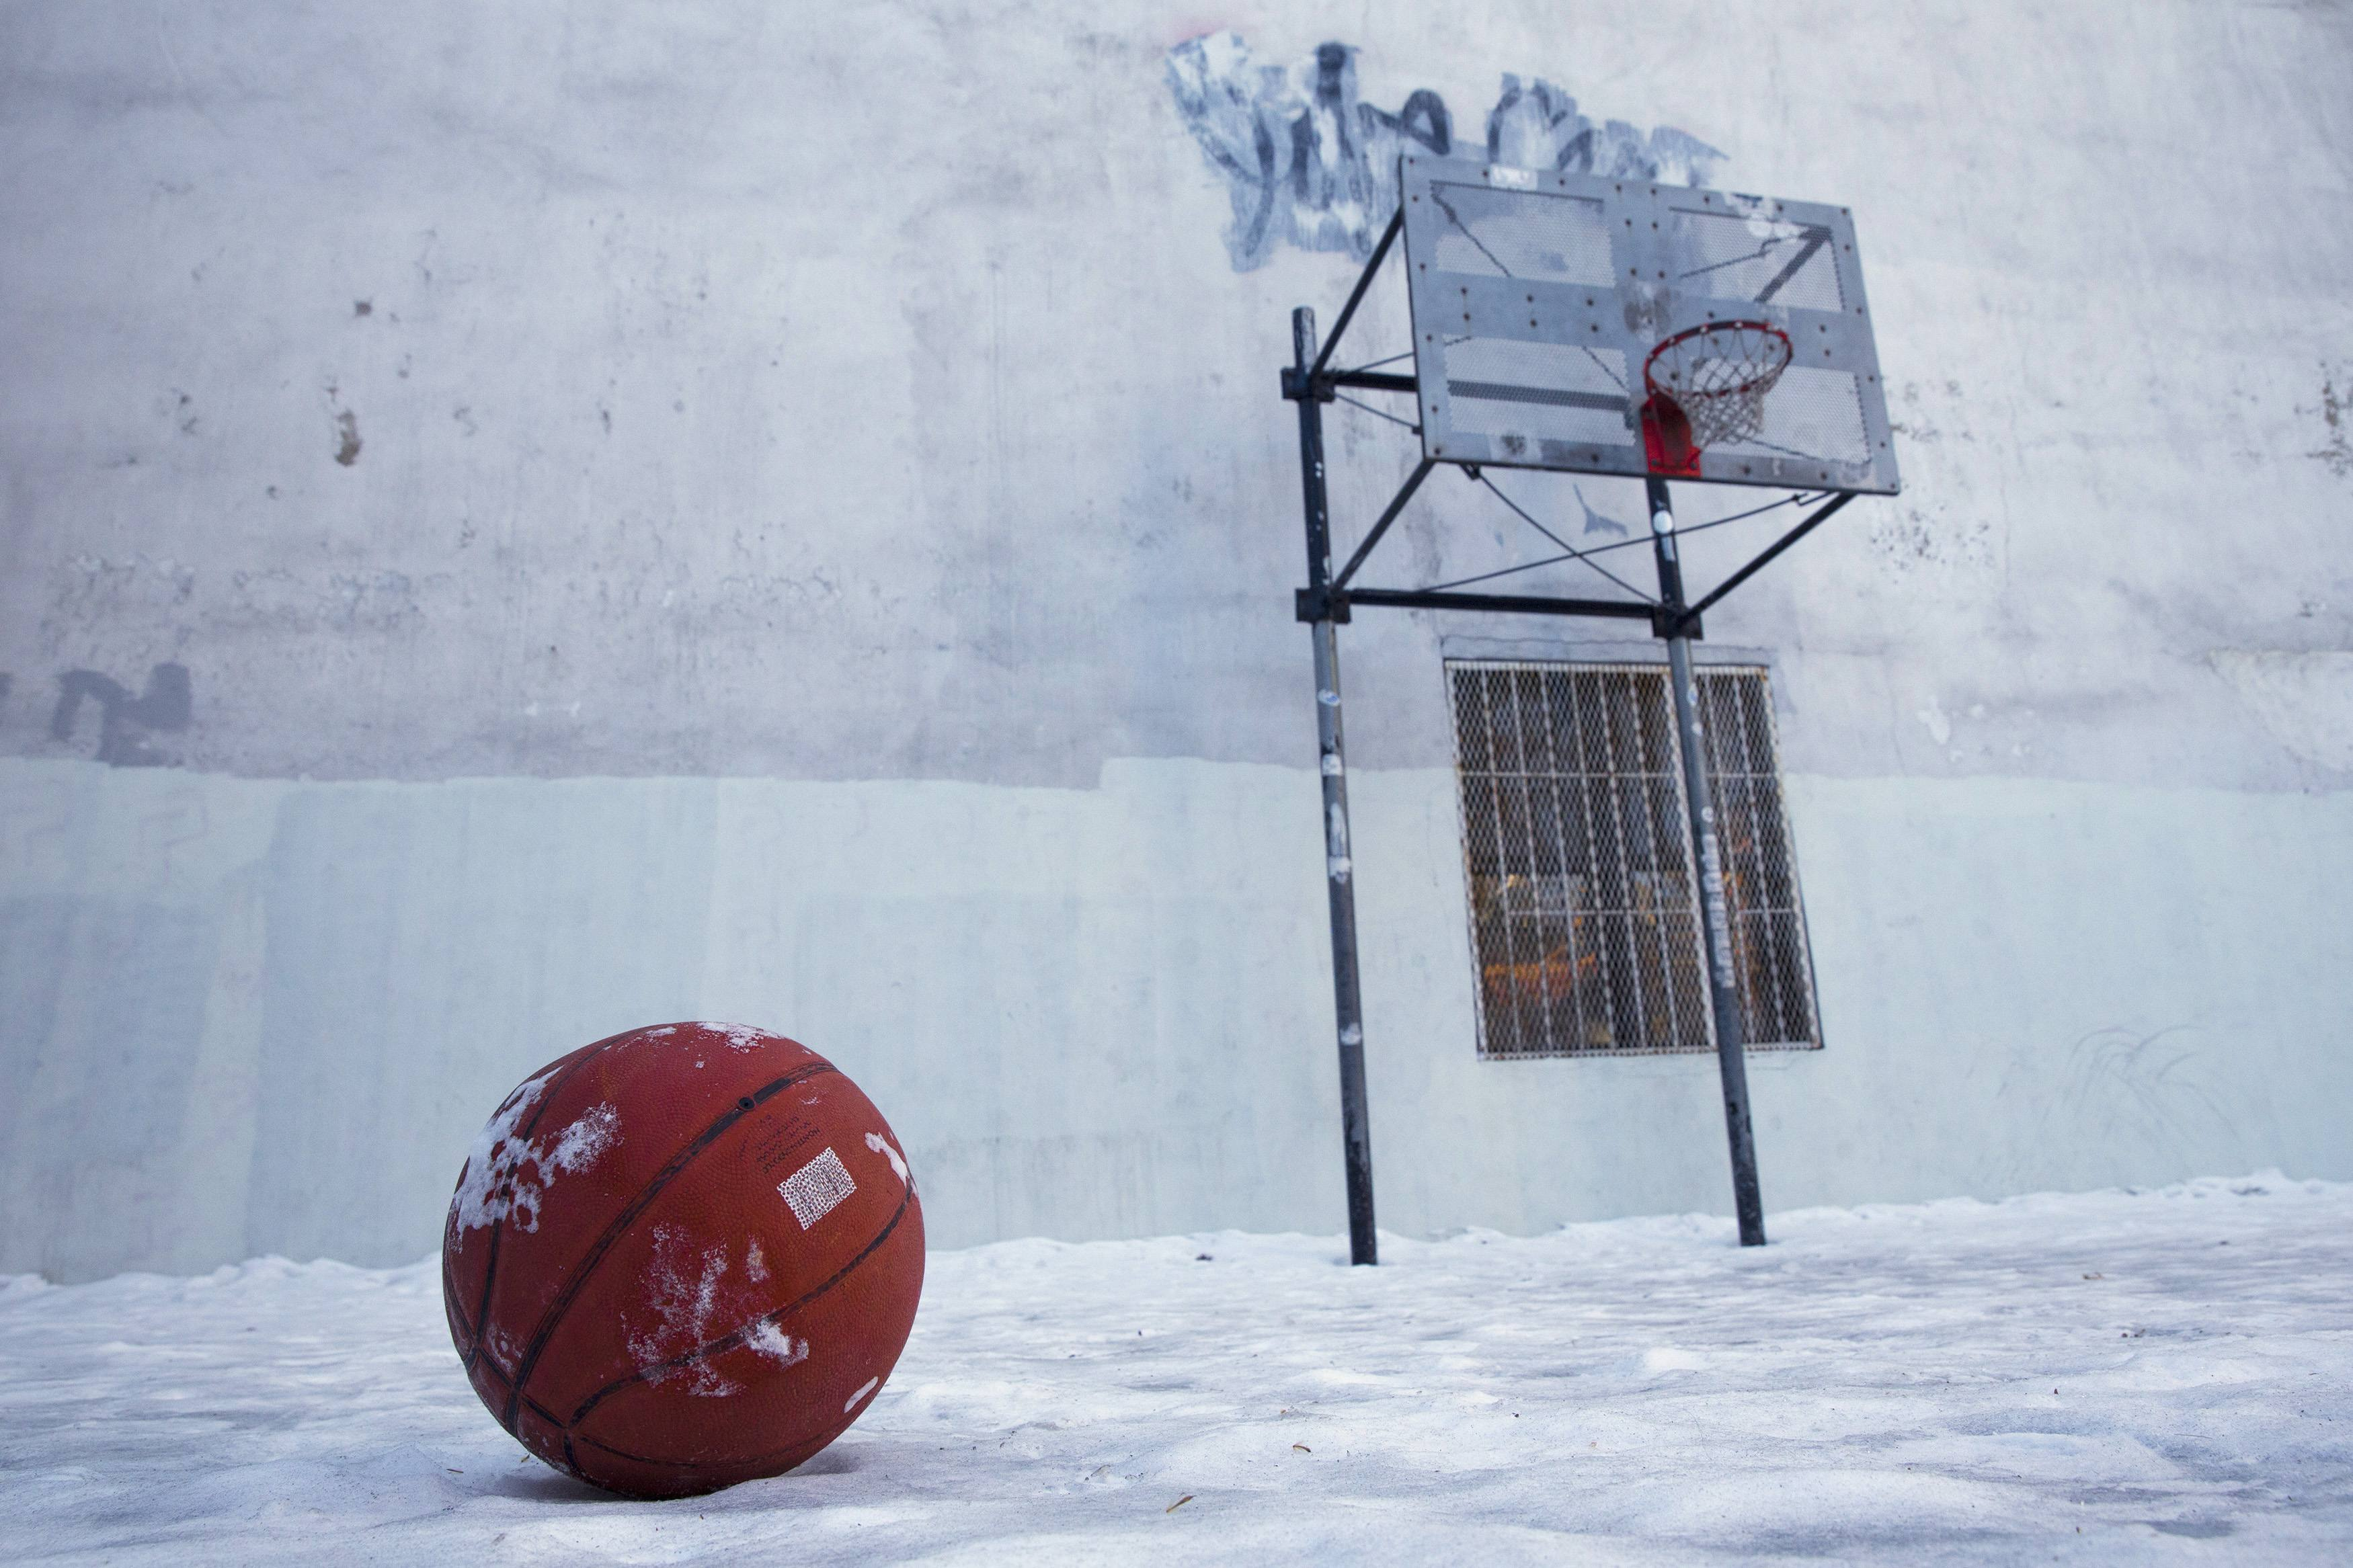 Basketball sits on a frozen basketball court in Lower Manhattan, New York